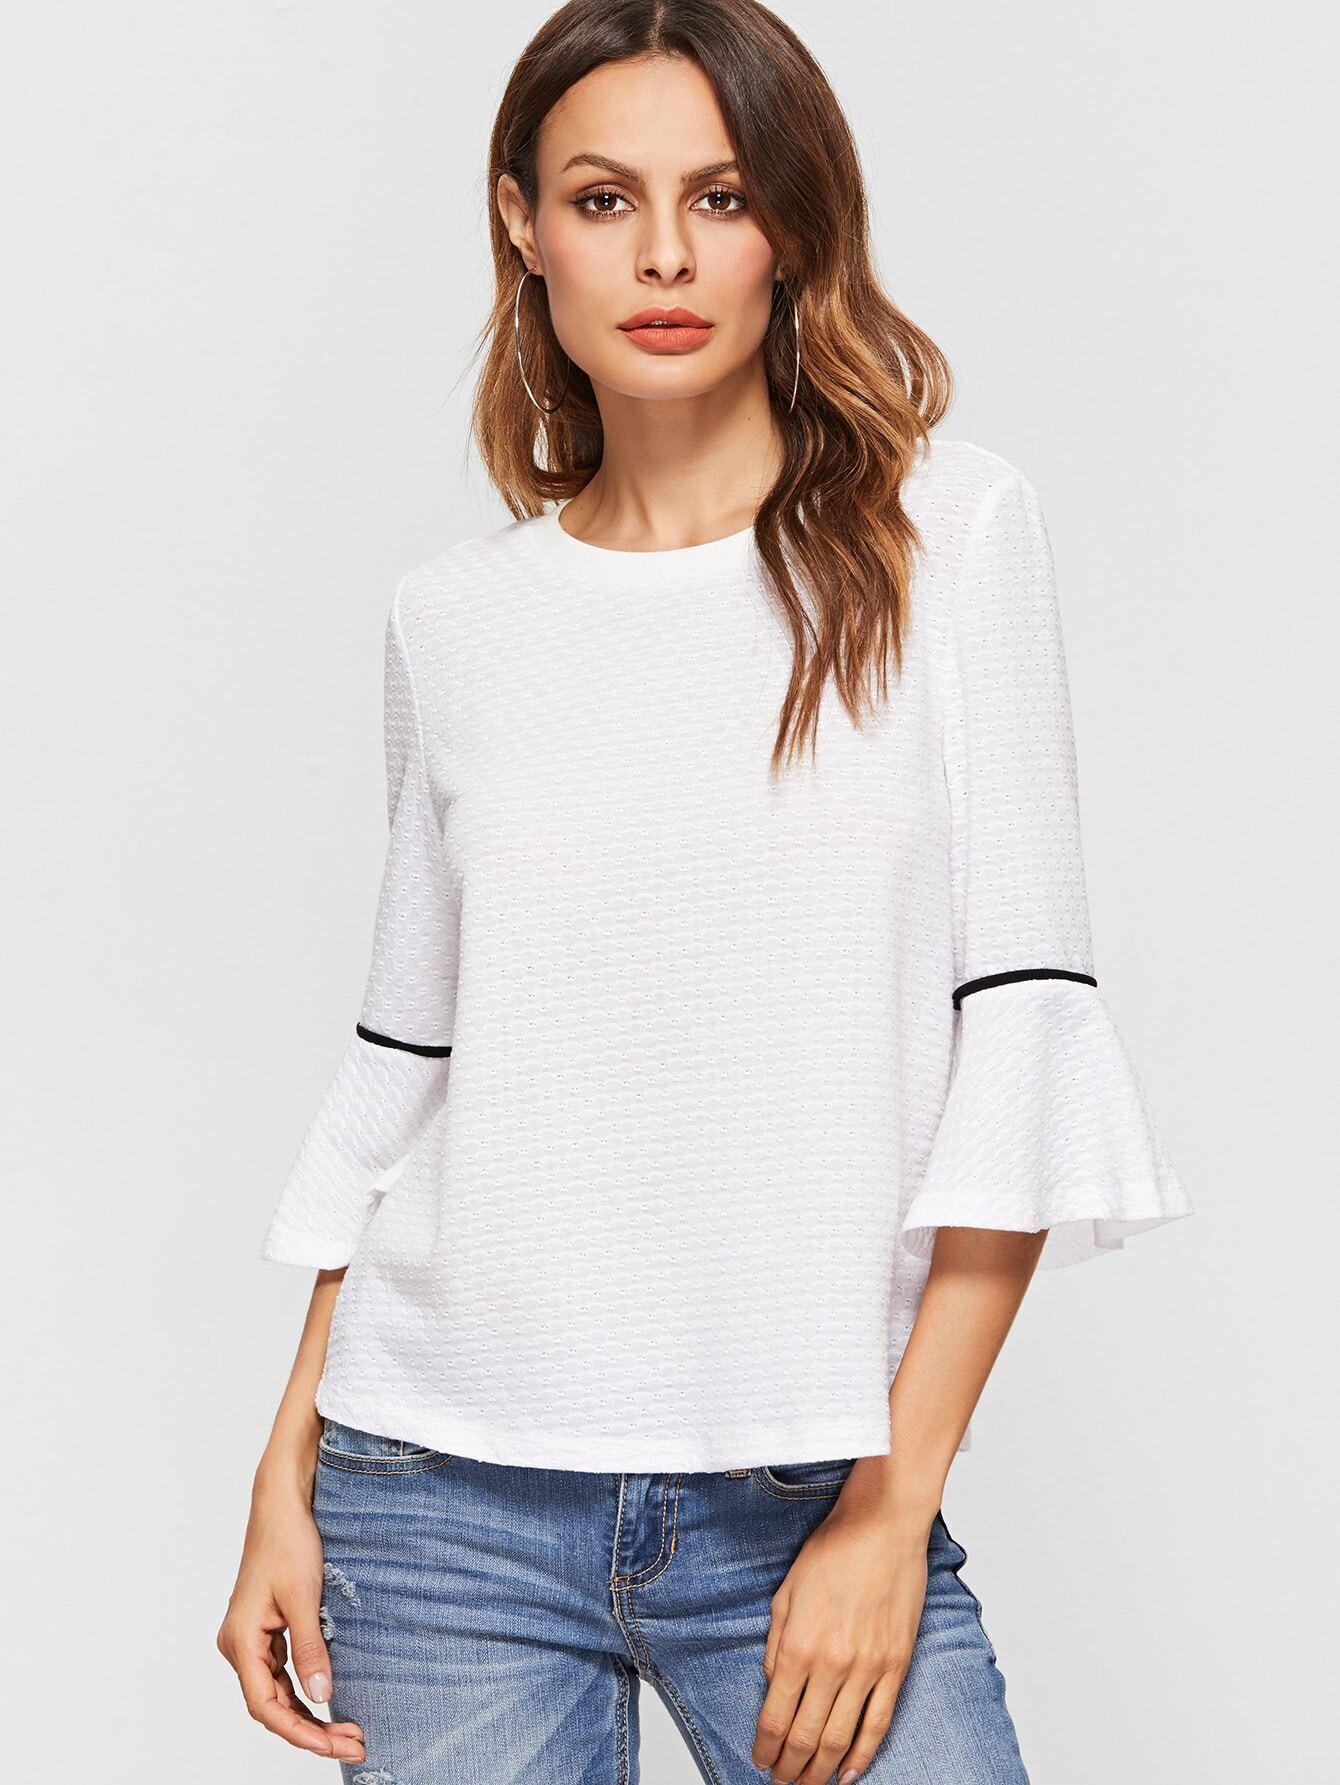 f67f1aad0a18a6 White Ruffle Cuff Elbow Sleeve Top EmmaCloth-Women Fast Fashion Online